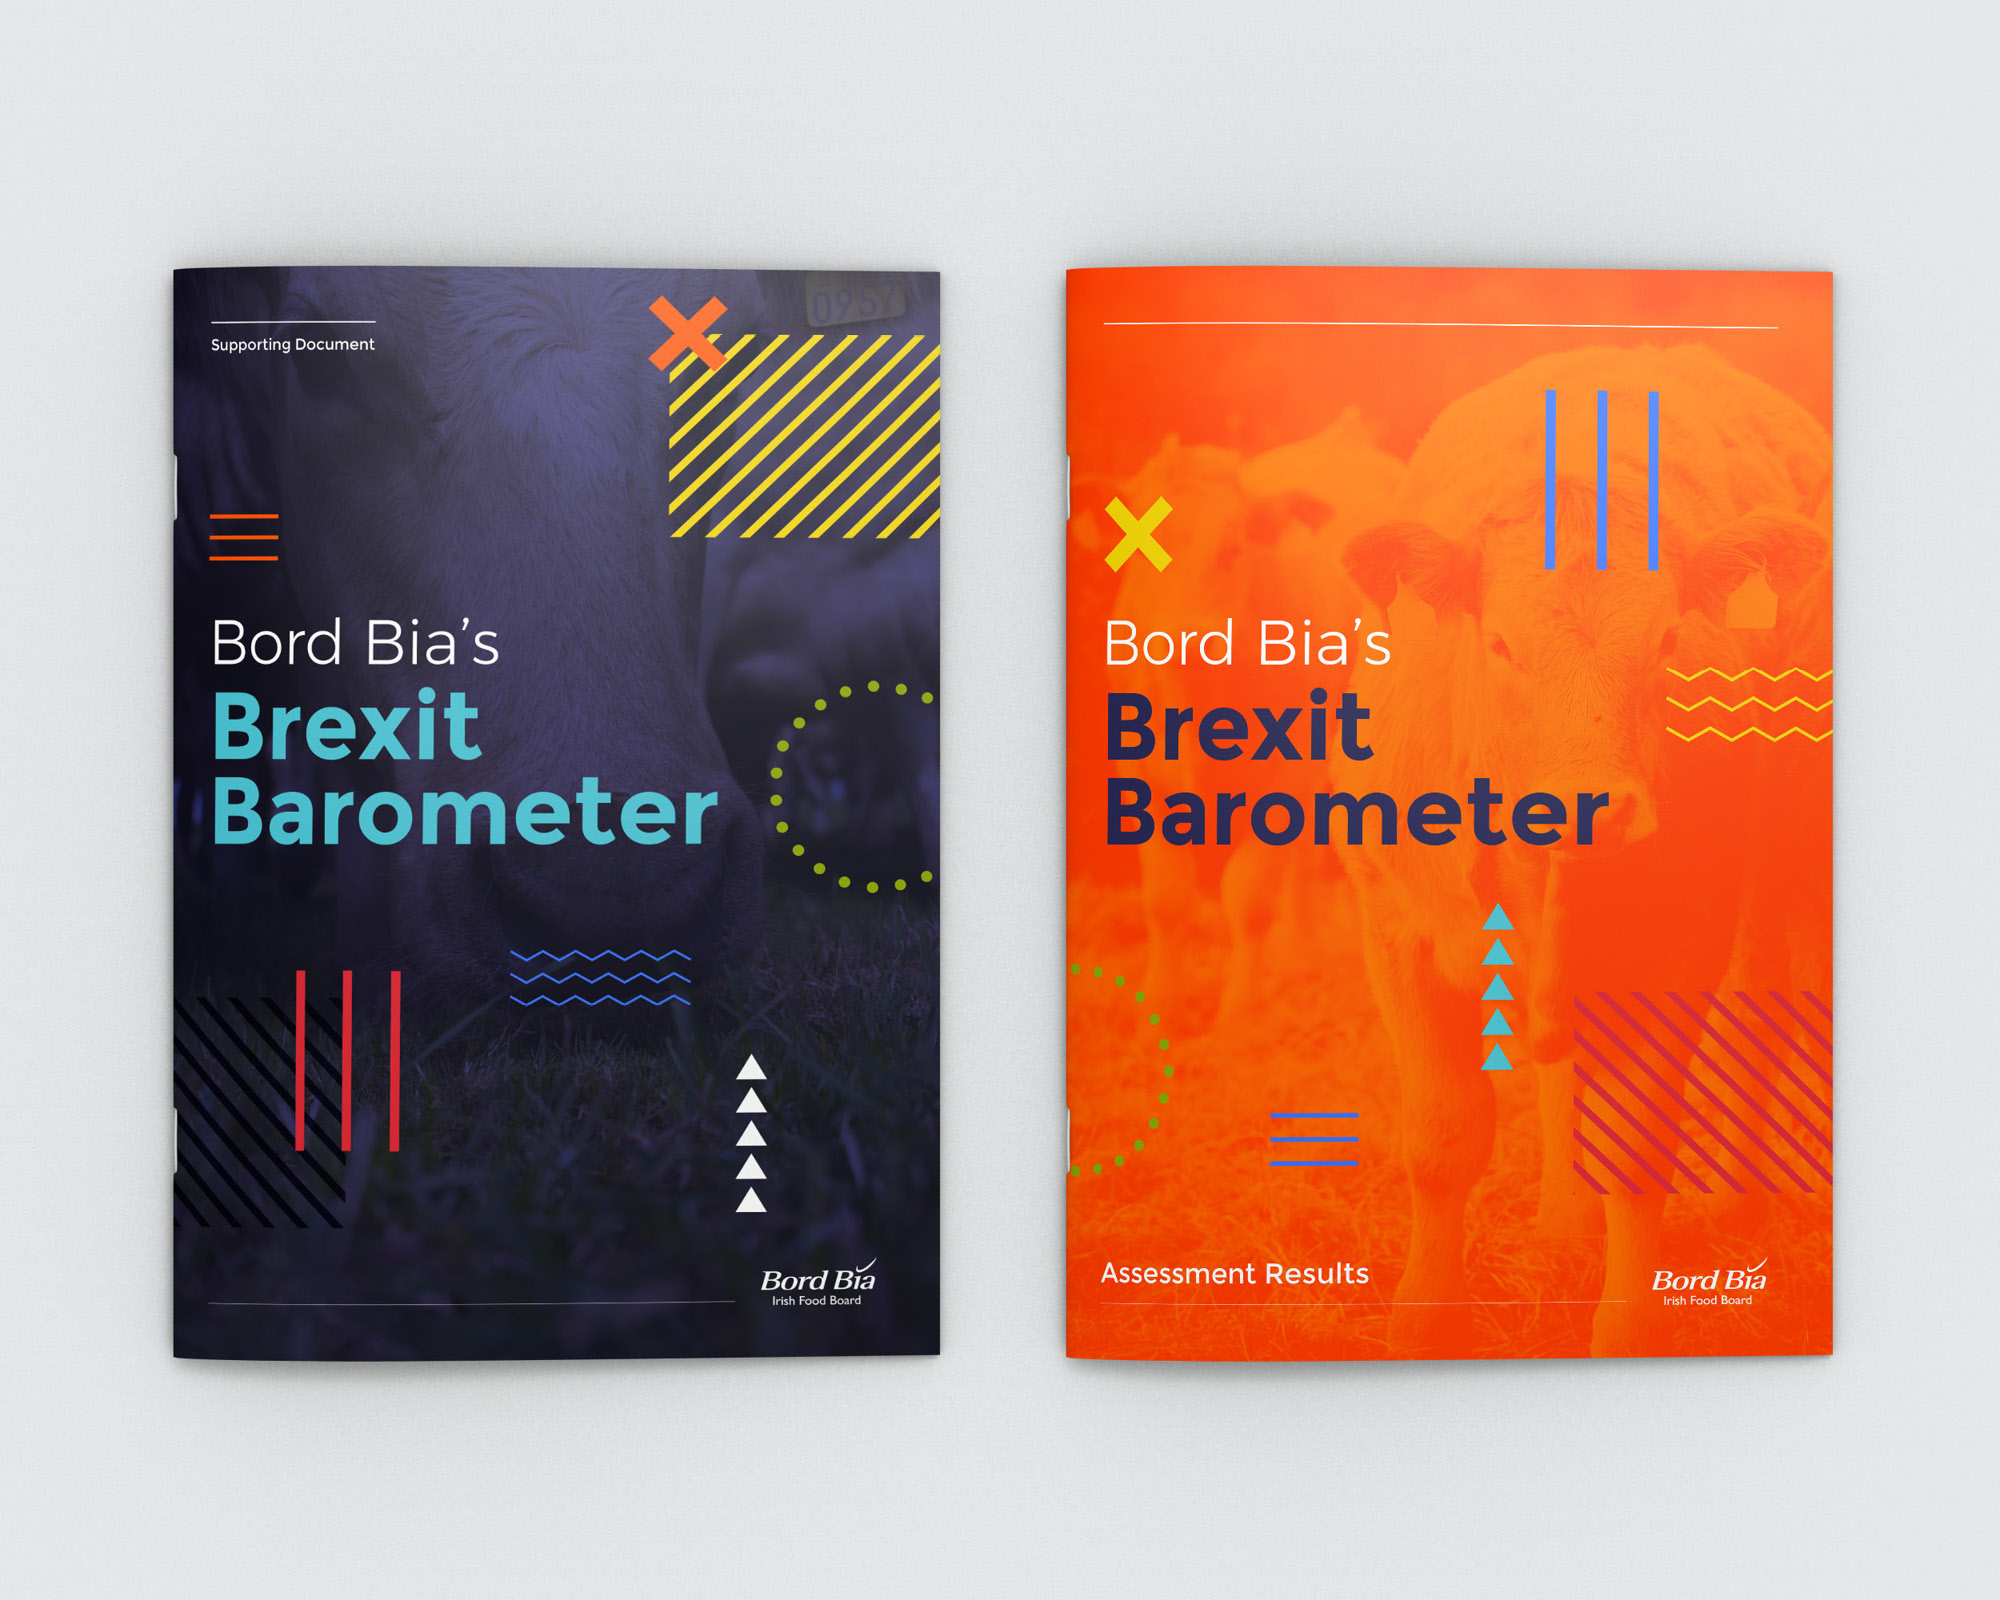 Cover image: Bord Bia's Brexit Barometer